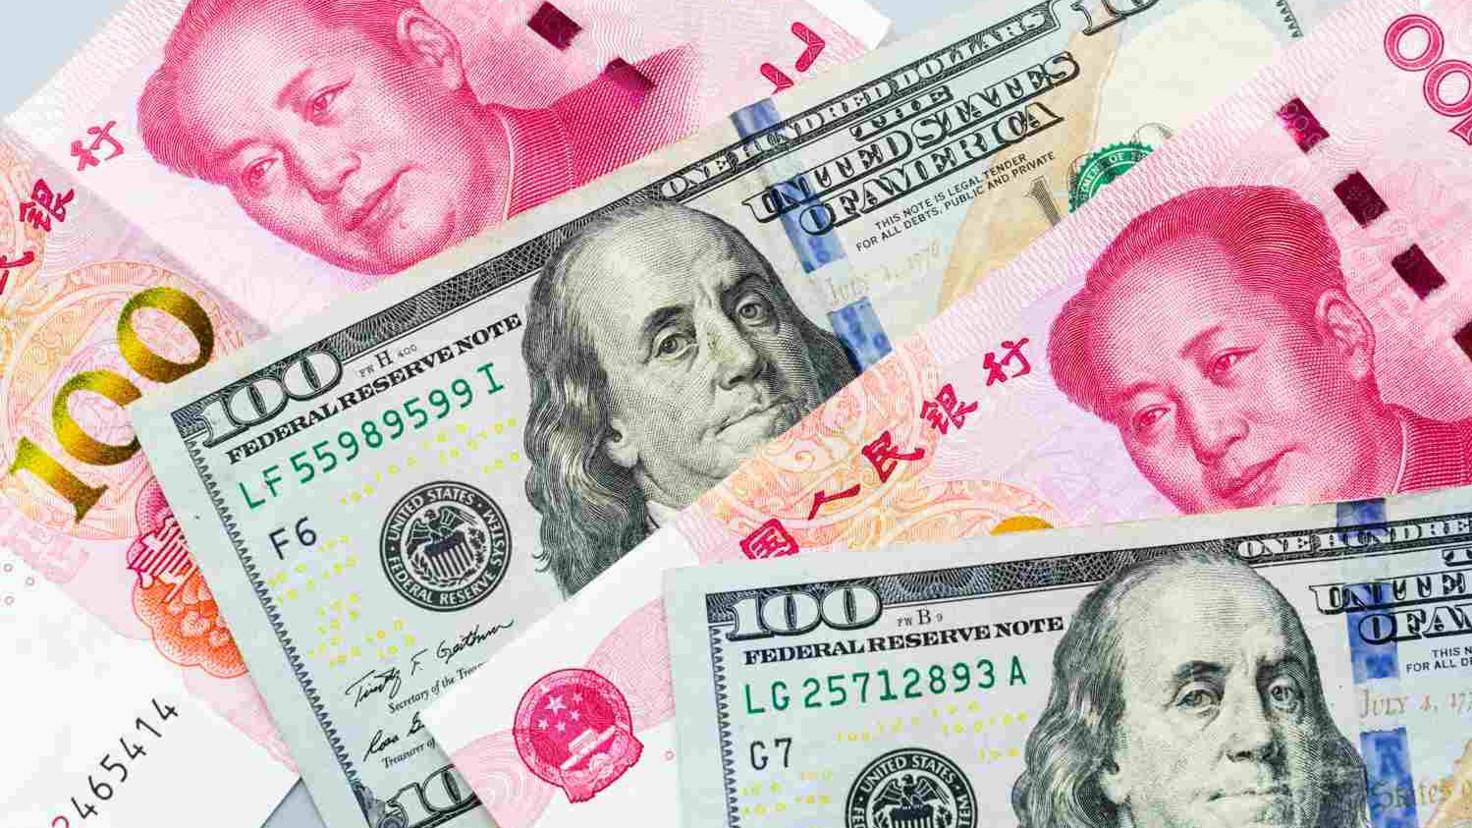 Investors eyeing Tencent after NBA debacle